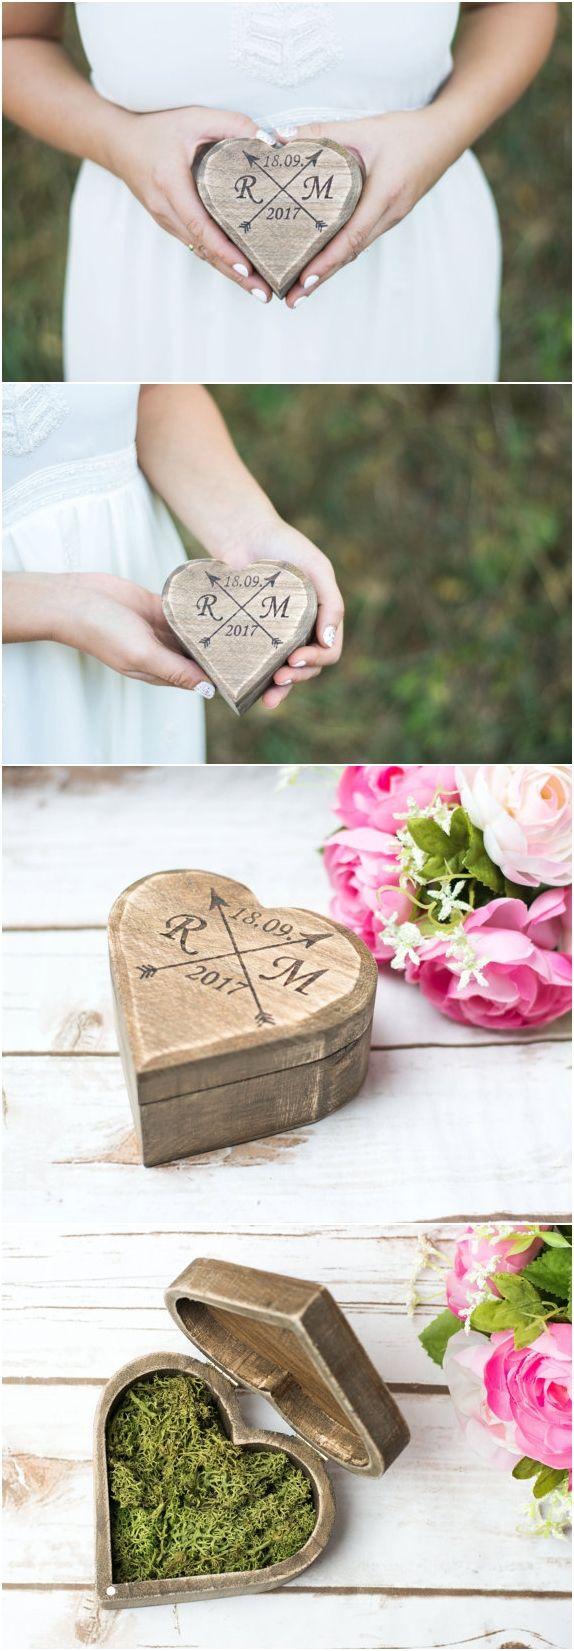 Best Wedding Ring Holders Ideas On Pinterest Diy Wedding